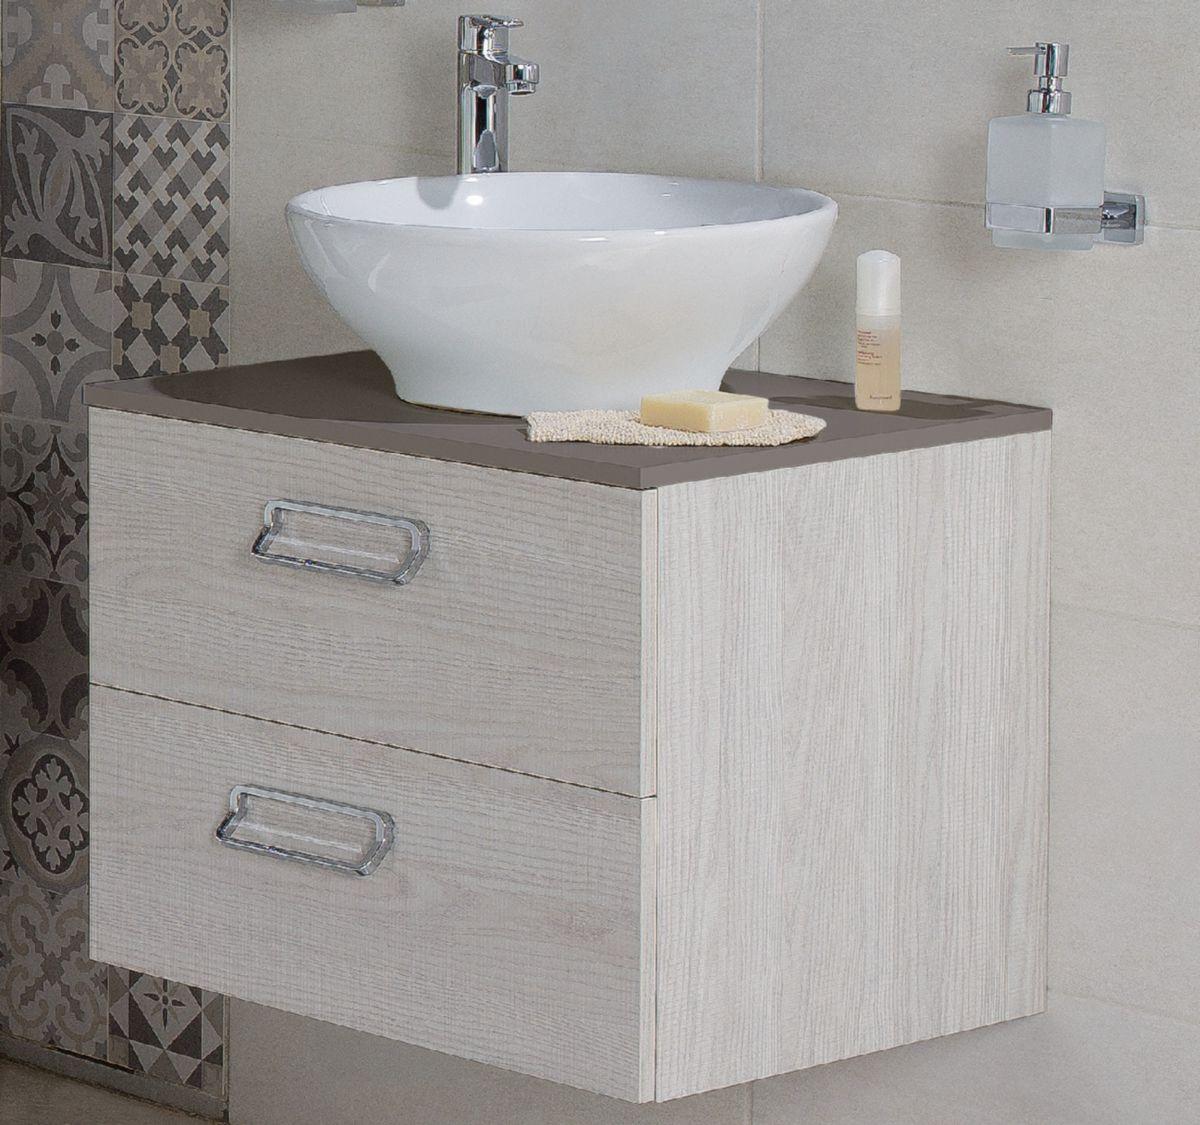 alterna plan 60 cm pour vasque poser taupe cedeo. Black Bedroom Furniture Sets. Home Design Ideas